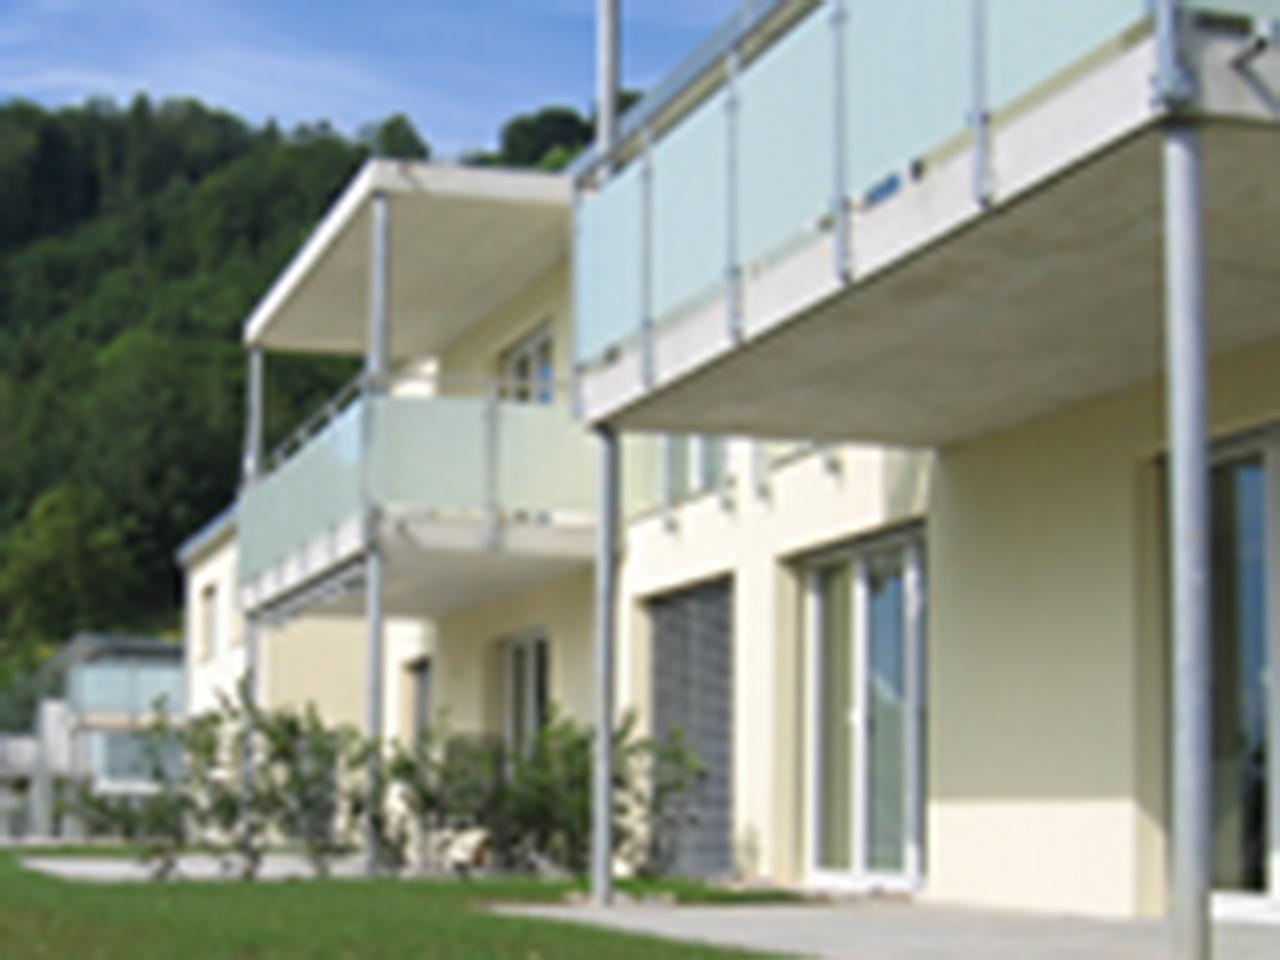 laubhus-architektur-mehrfamilienhaus-vorderrein